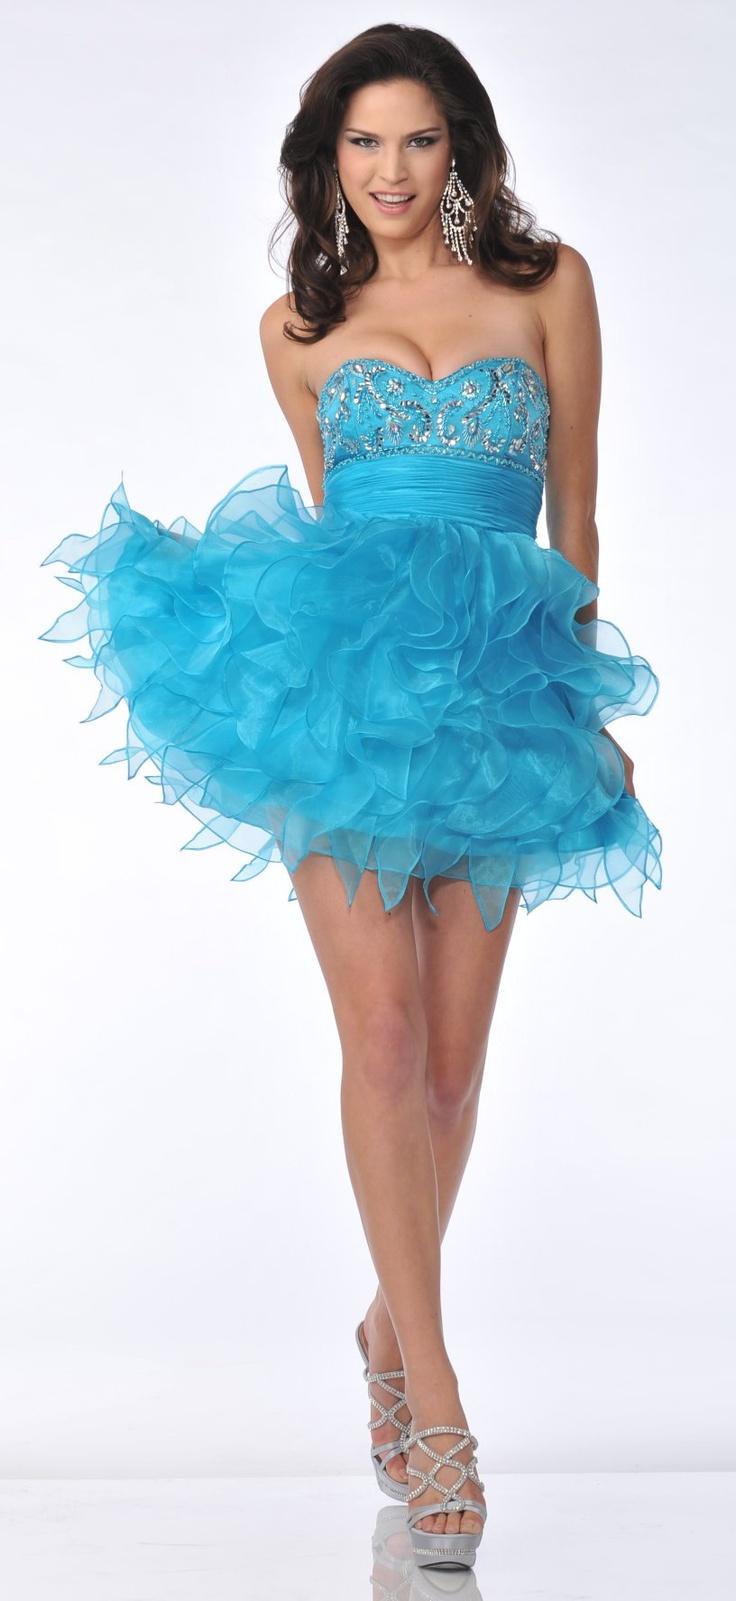 Amazing Short Tight Prom Dress Ideas - Colorful Wedding Dress Ideas ...